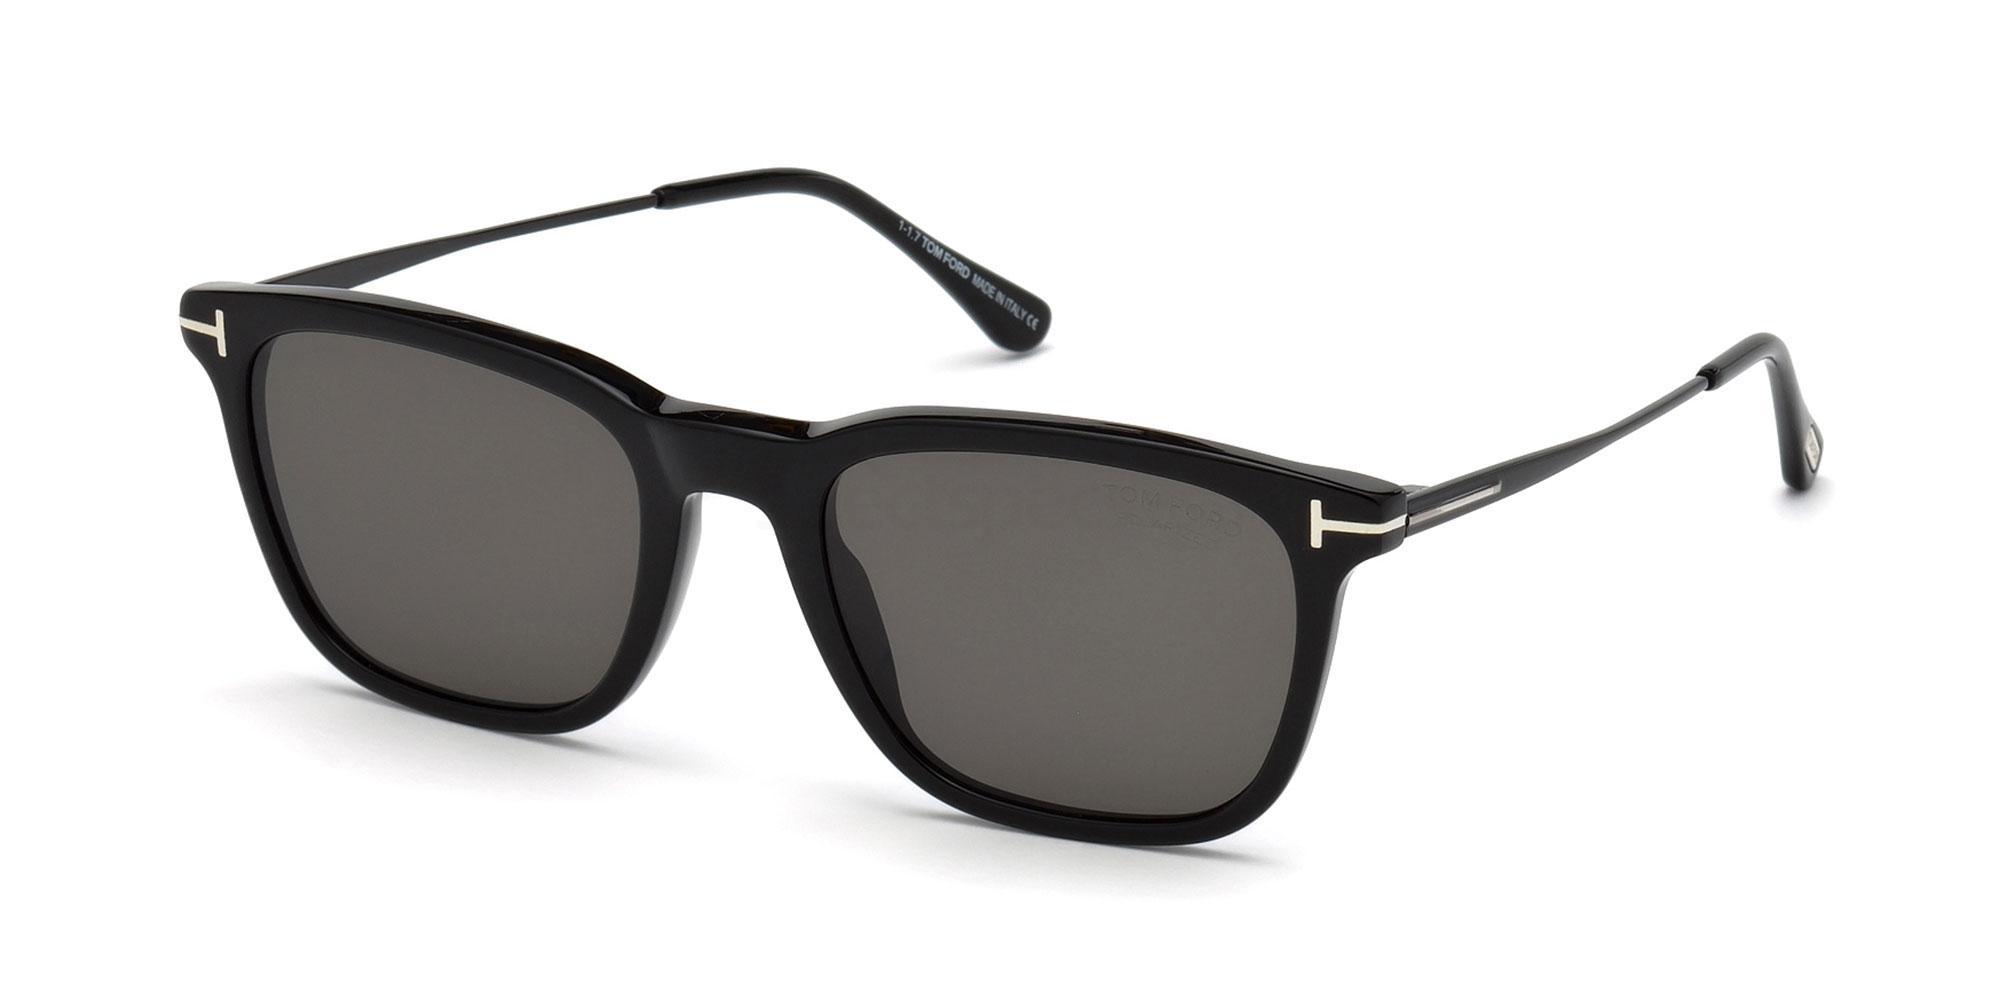 01D FT0625 Sunglasses, Tom Ford